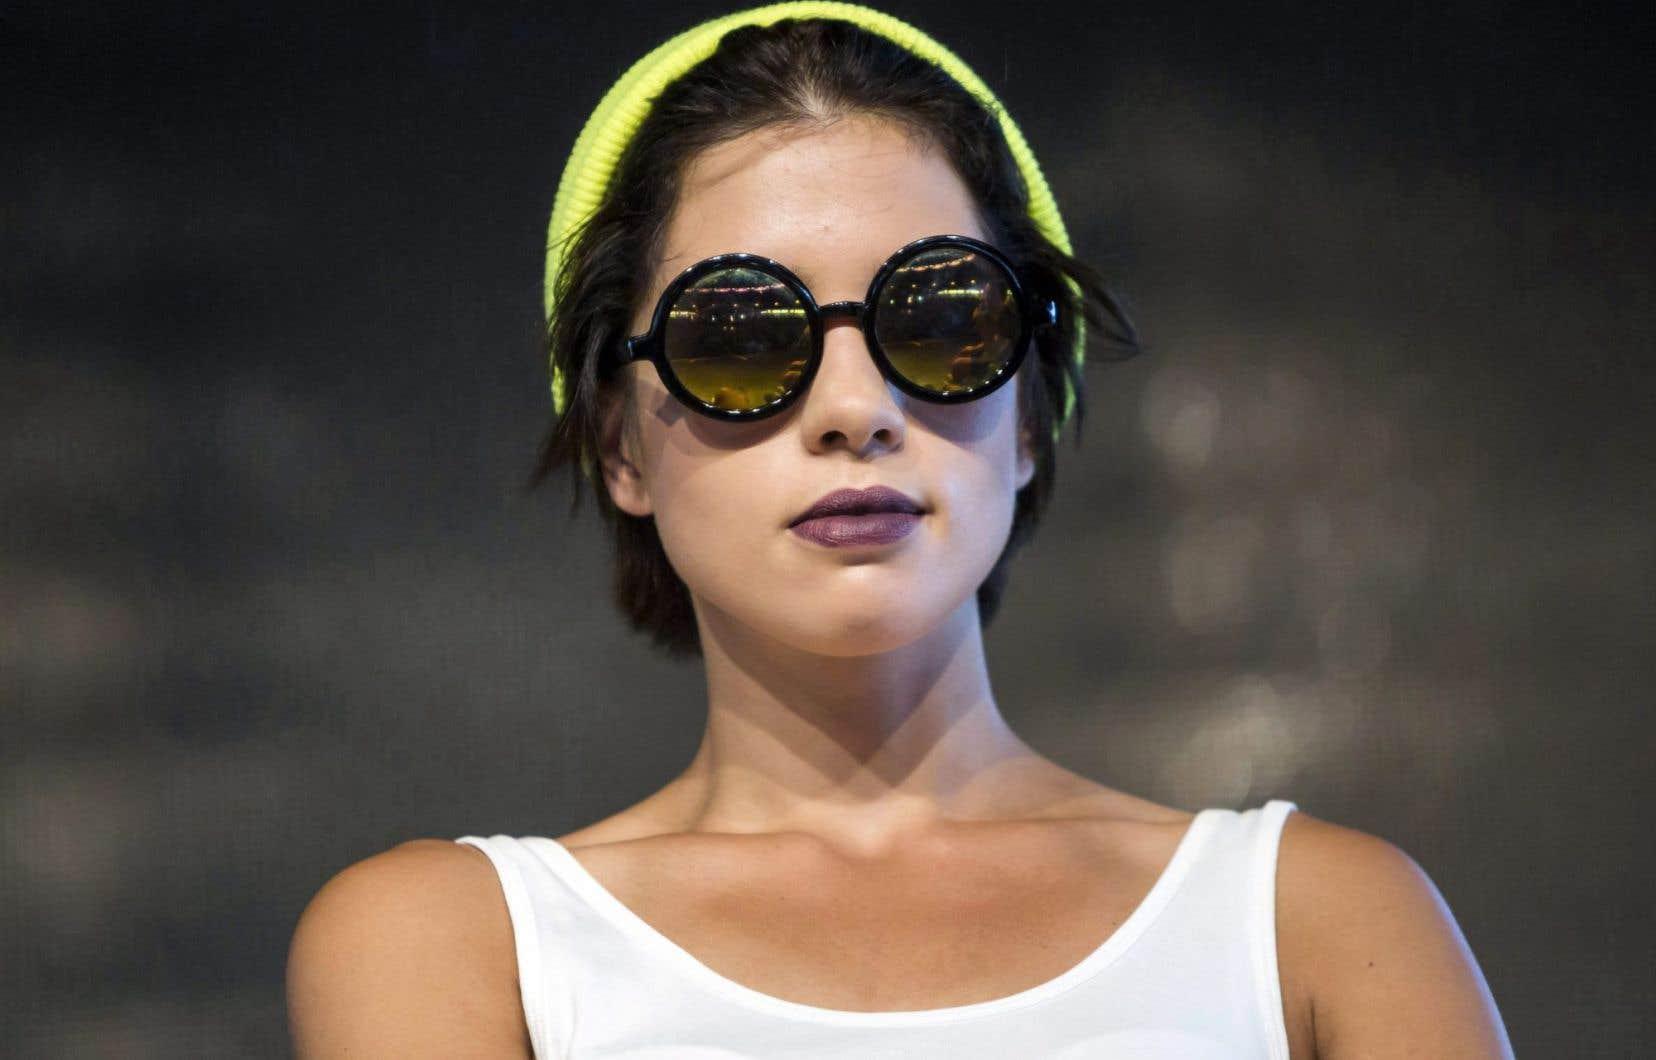 La chanteuse du groupe punk contestataire russe Pussy Riot, Nadejda Tolokonnikova